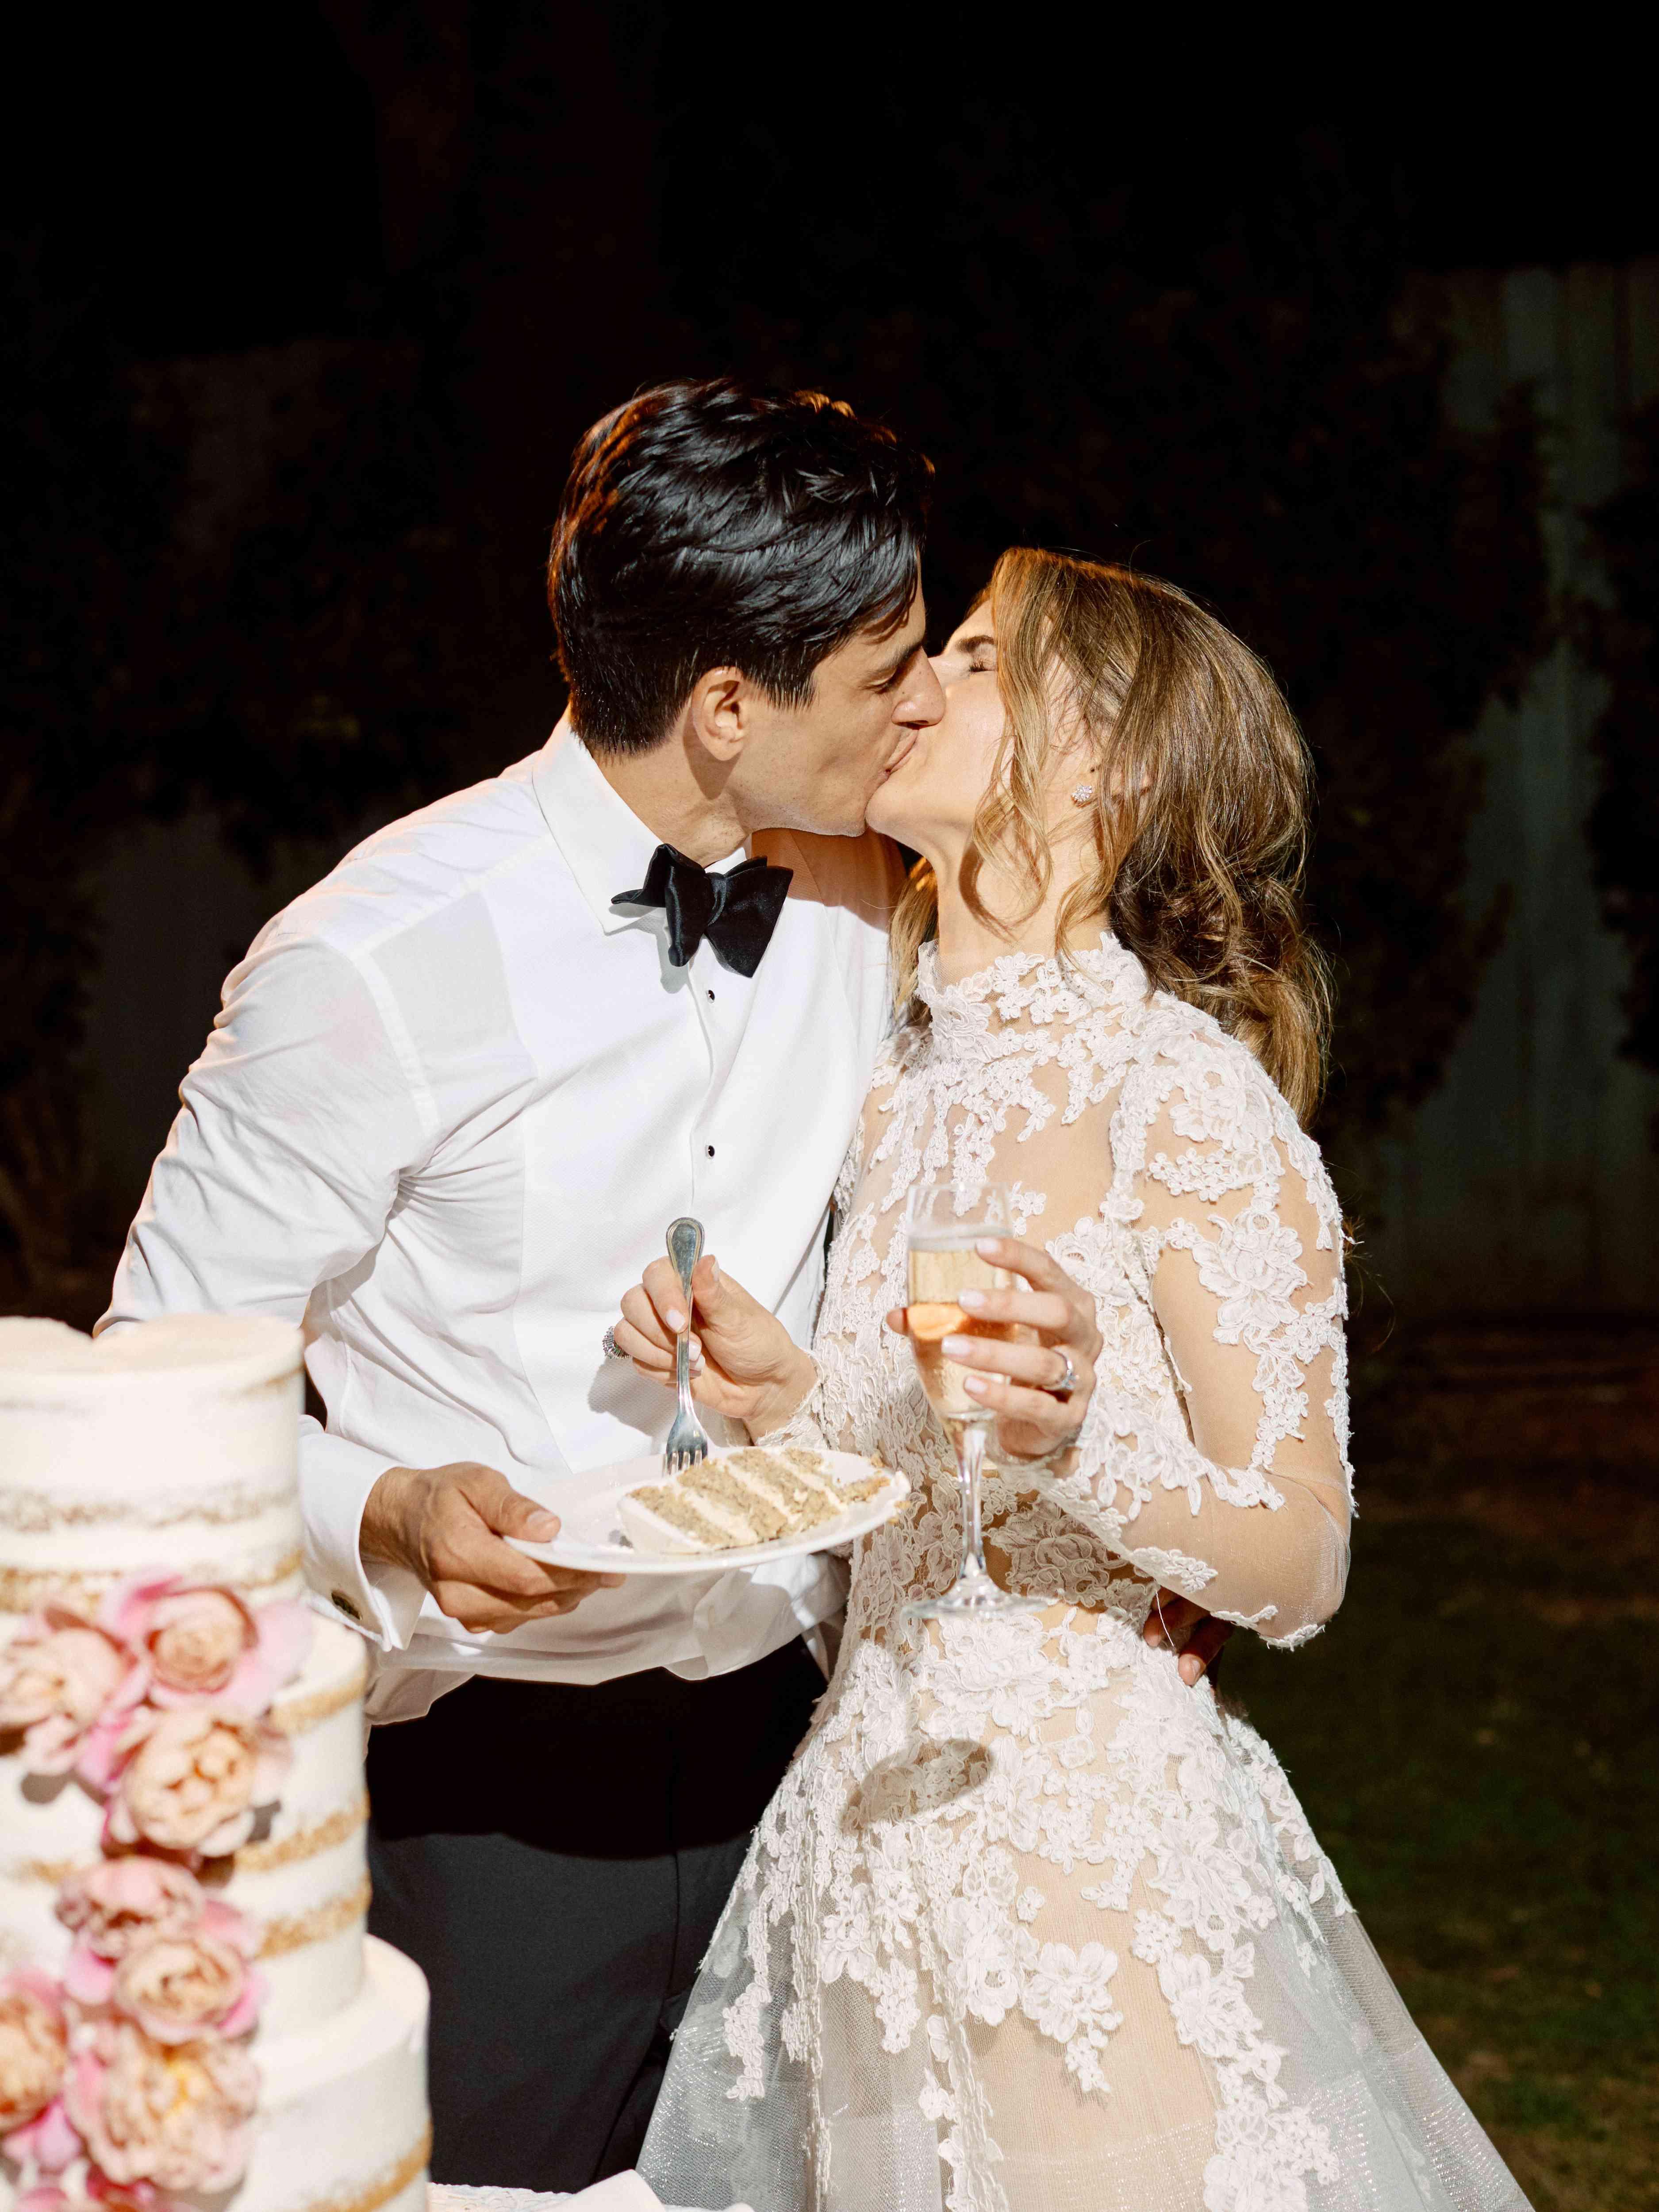 cutting cake kissing